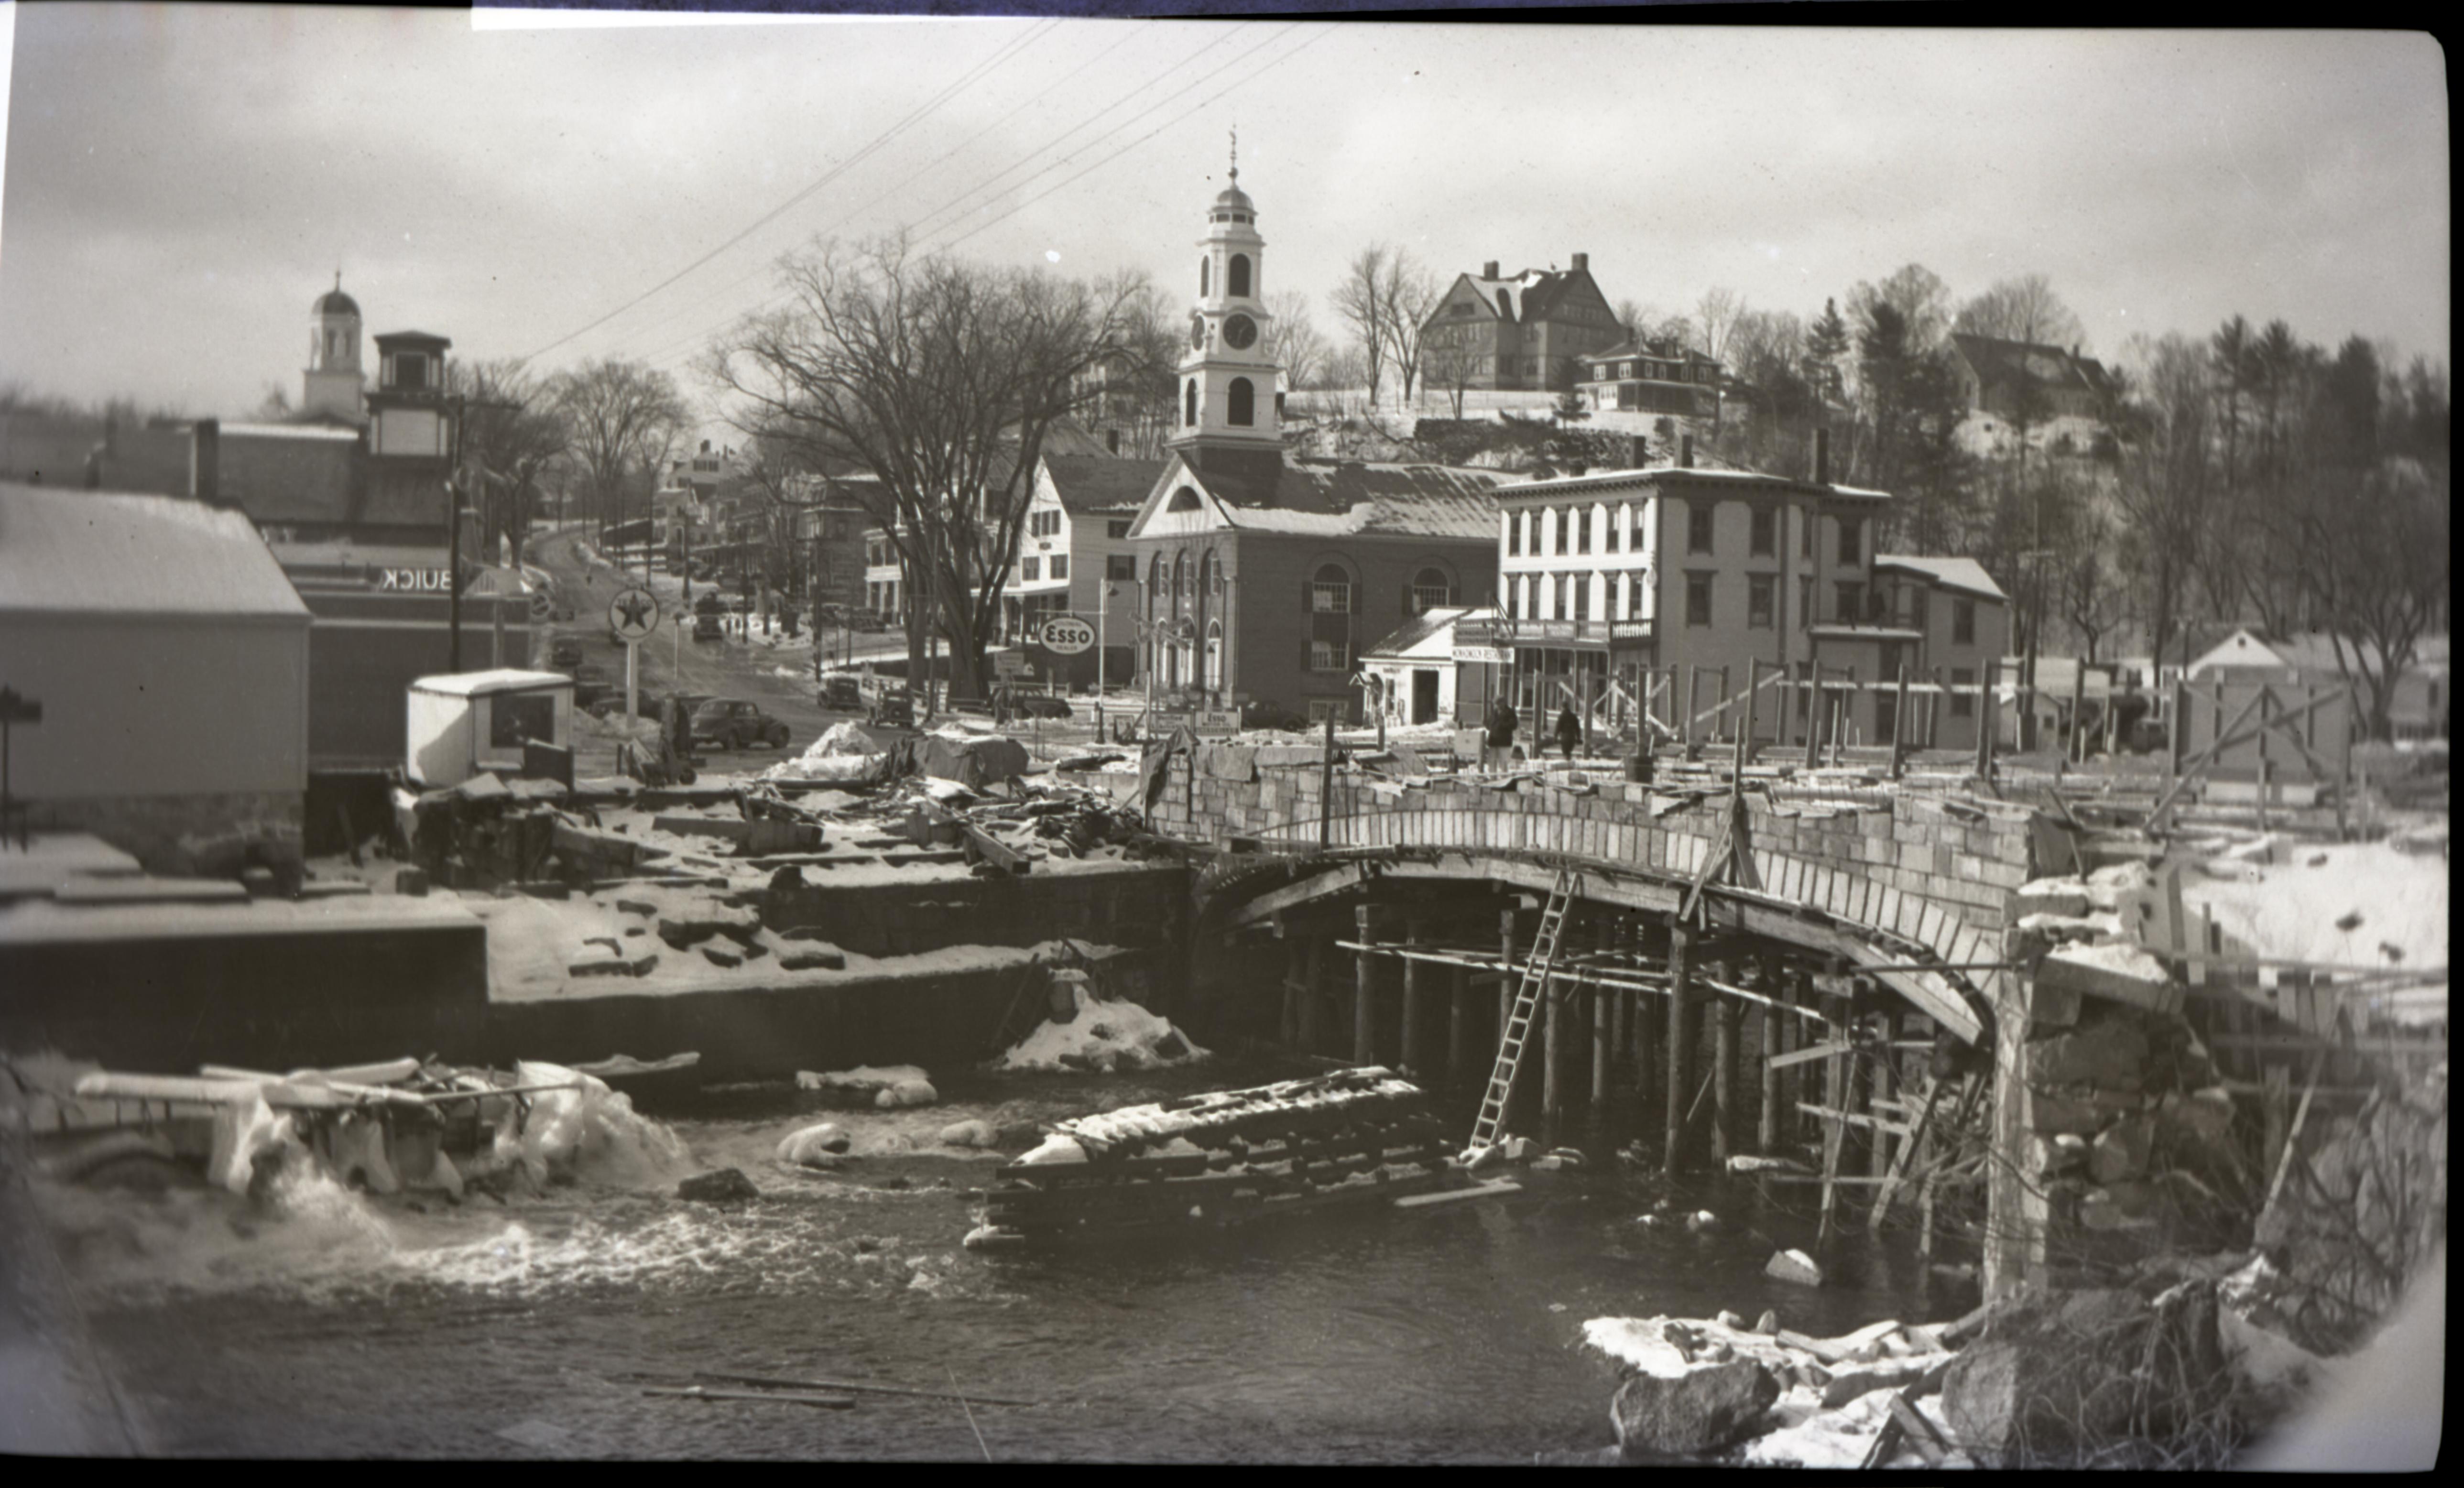 1940 Bridge Construction - South Elevation of Bridge